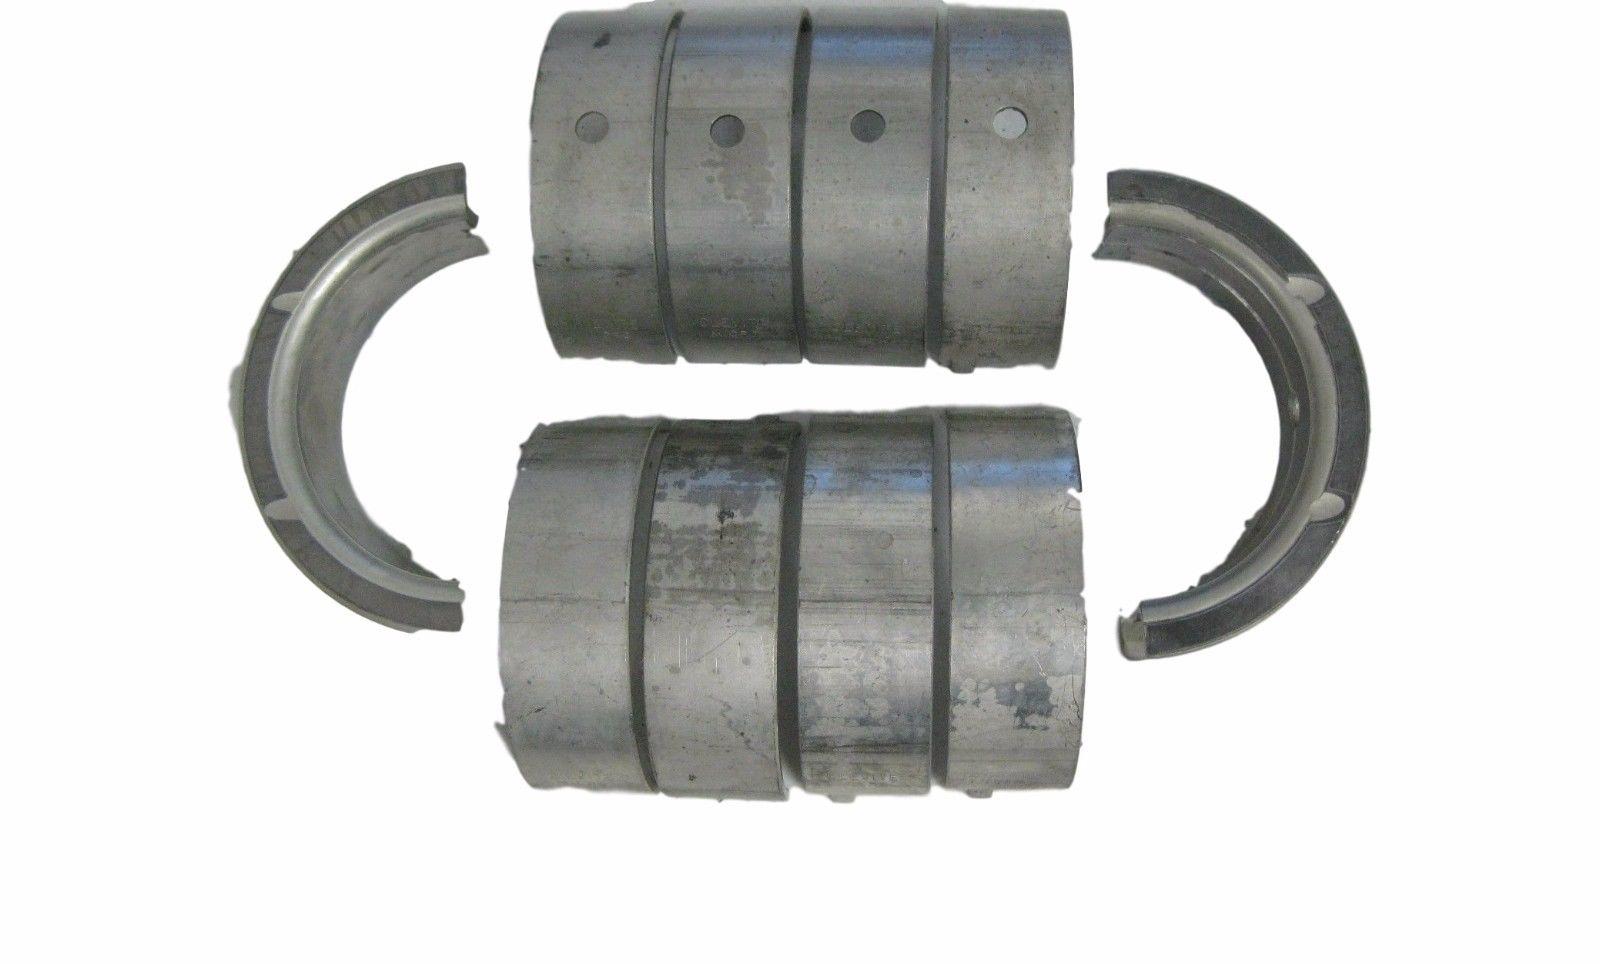 Qiorange 1.14 Digital LCD Tyre Tire Tread Depth Gauge 0-25.4mm Metric//inch